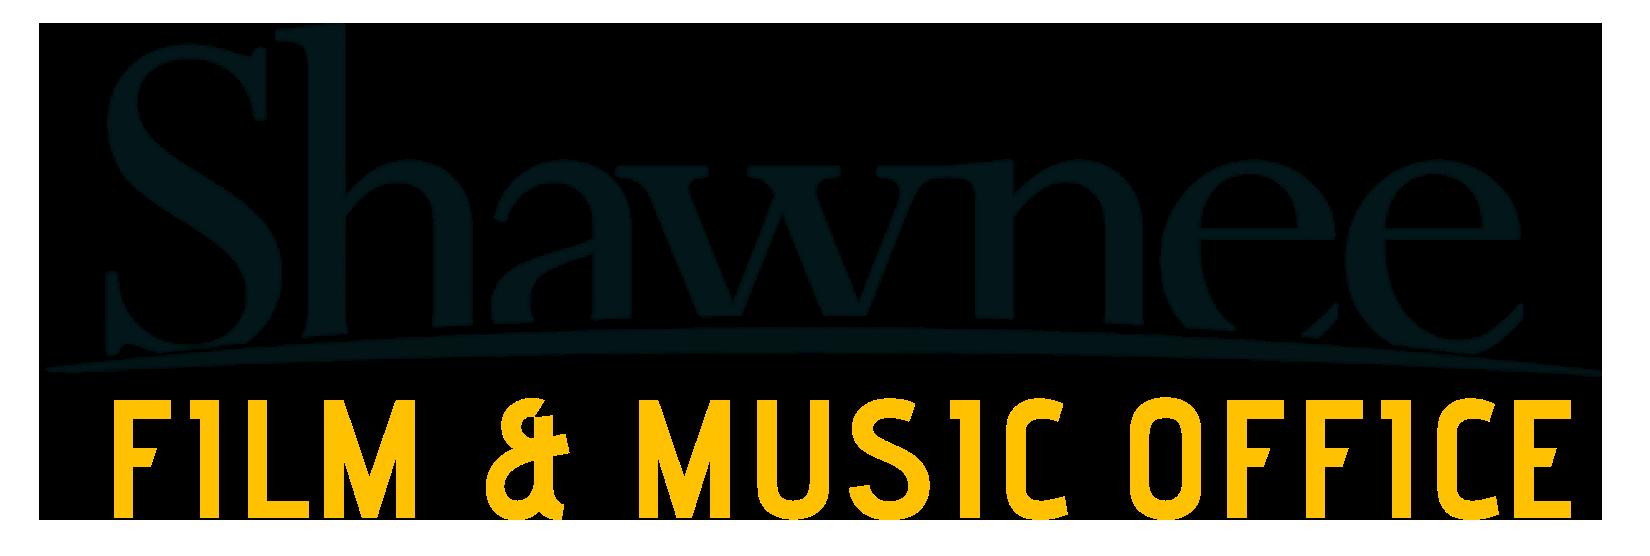 Shawnee Film and Music Logo